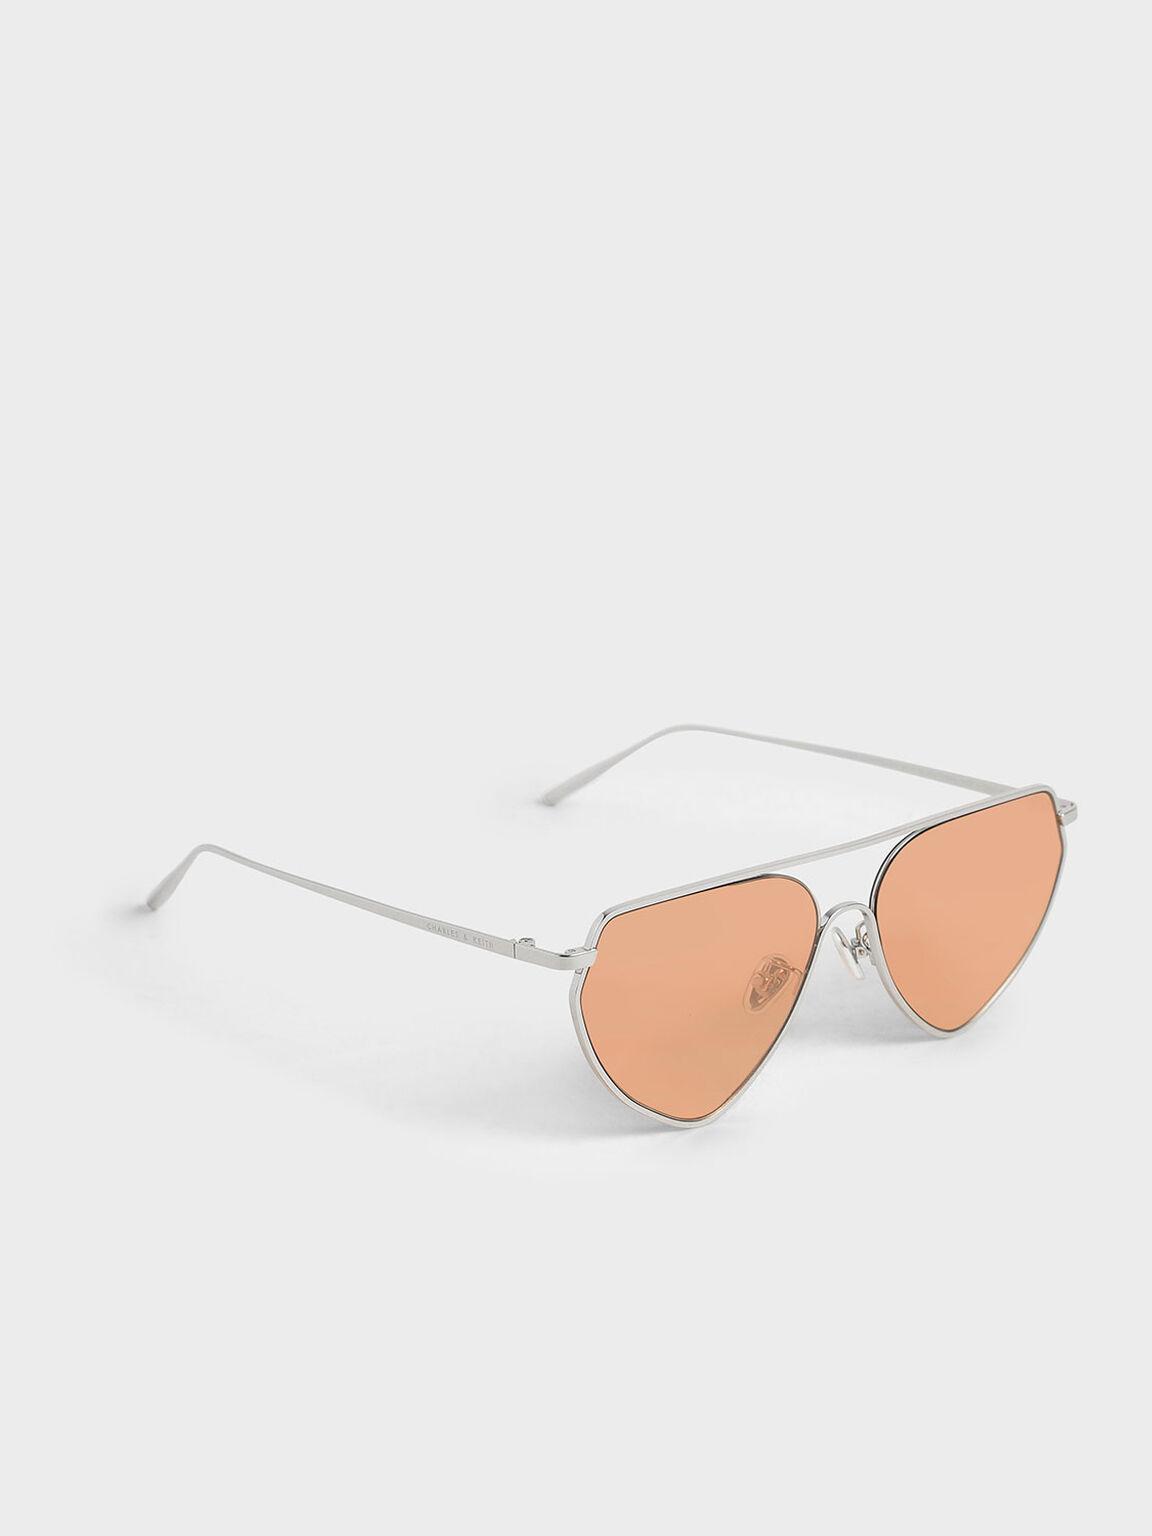 Thin Metal Frame Geometric Sunglasses, Orange, hi-res